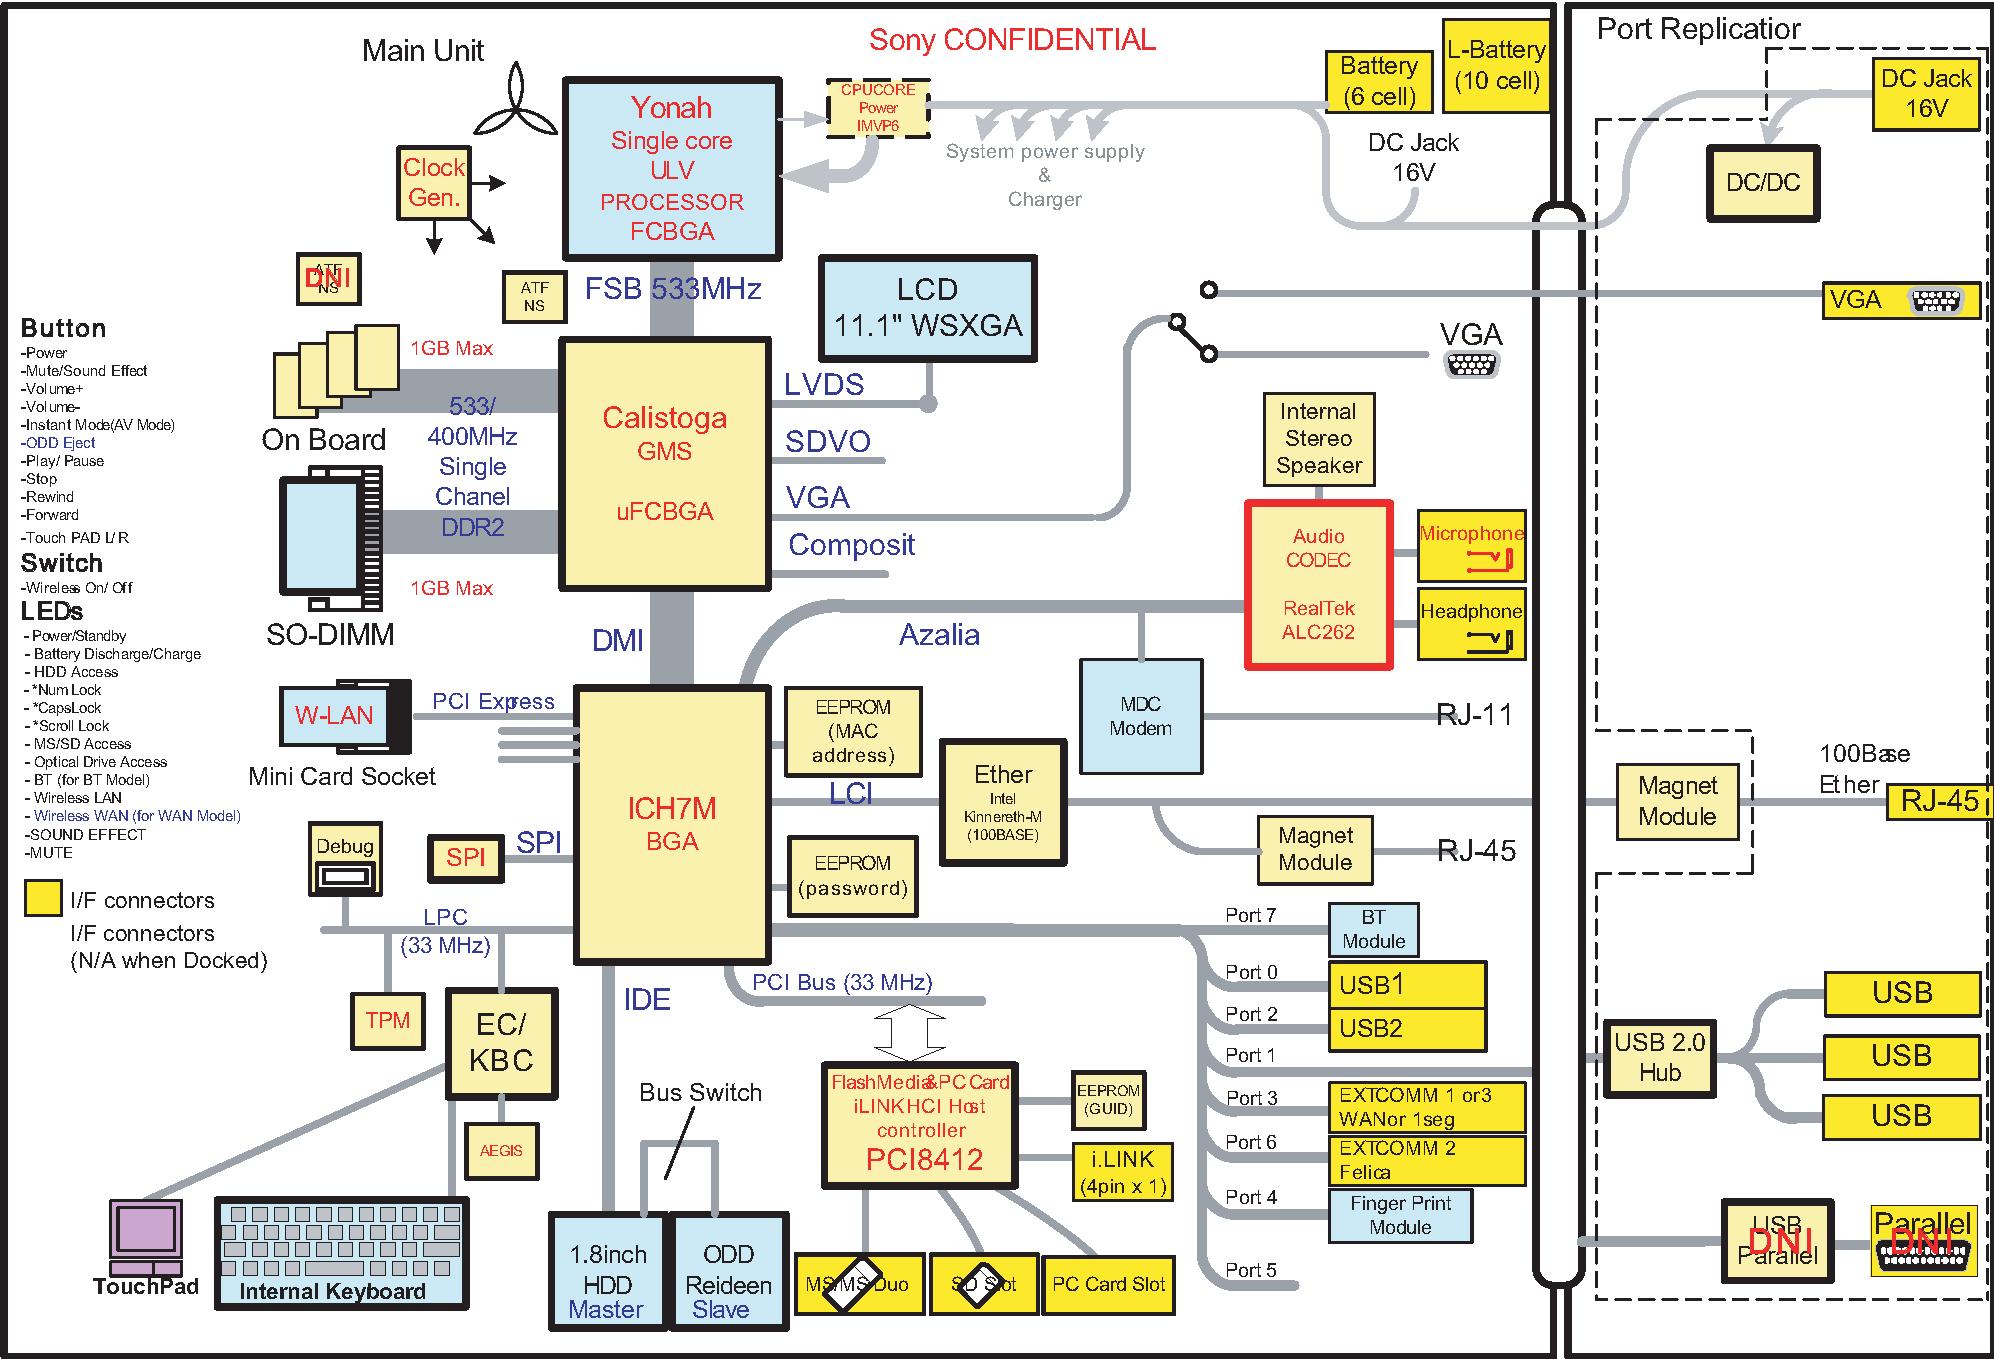 Tremendous Motherboard Schematic Diagram Basic Electronics Wiring Diagram Wiring Cloud Dulfrecoveryedborg